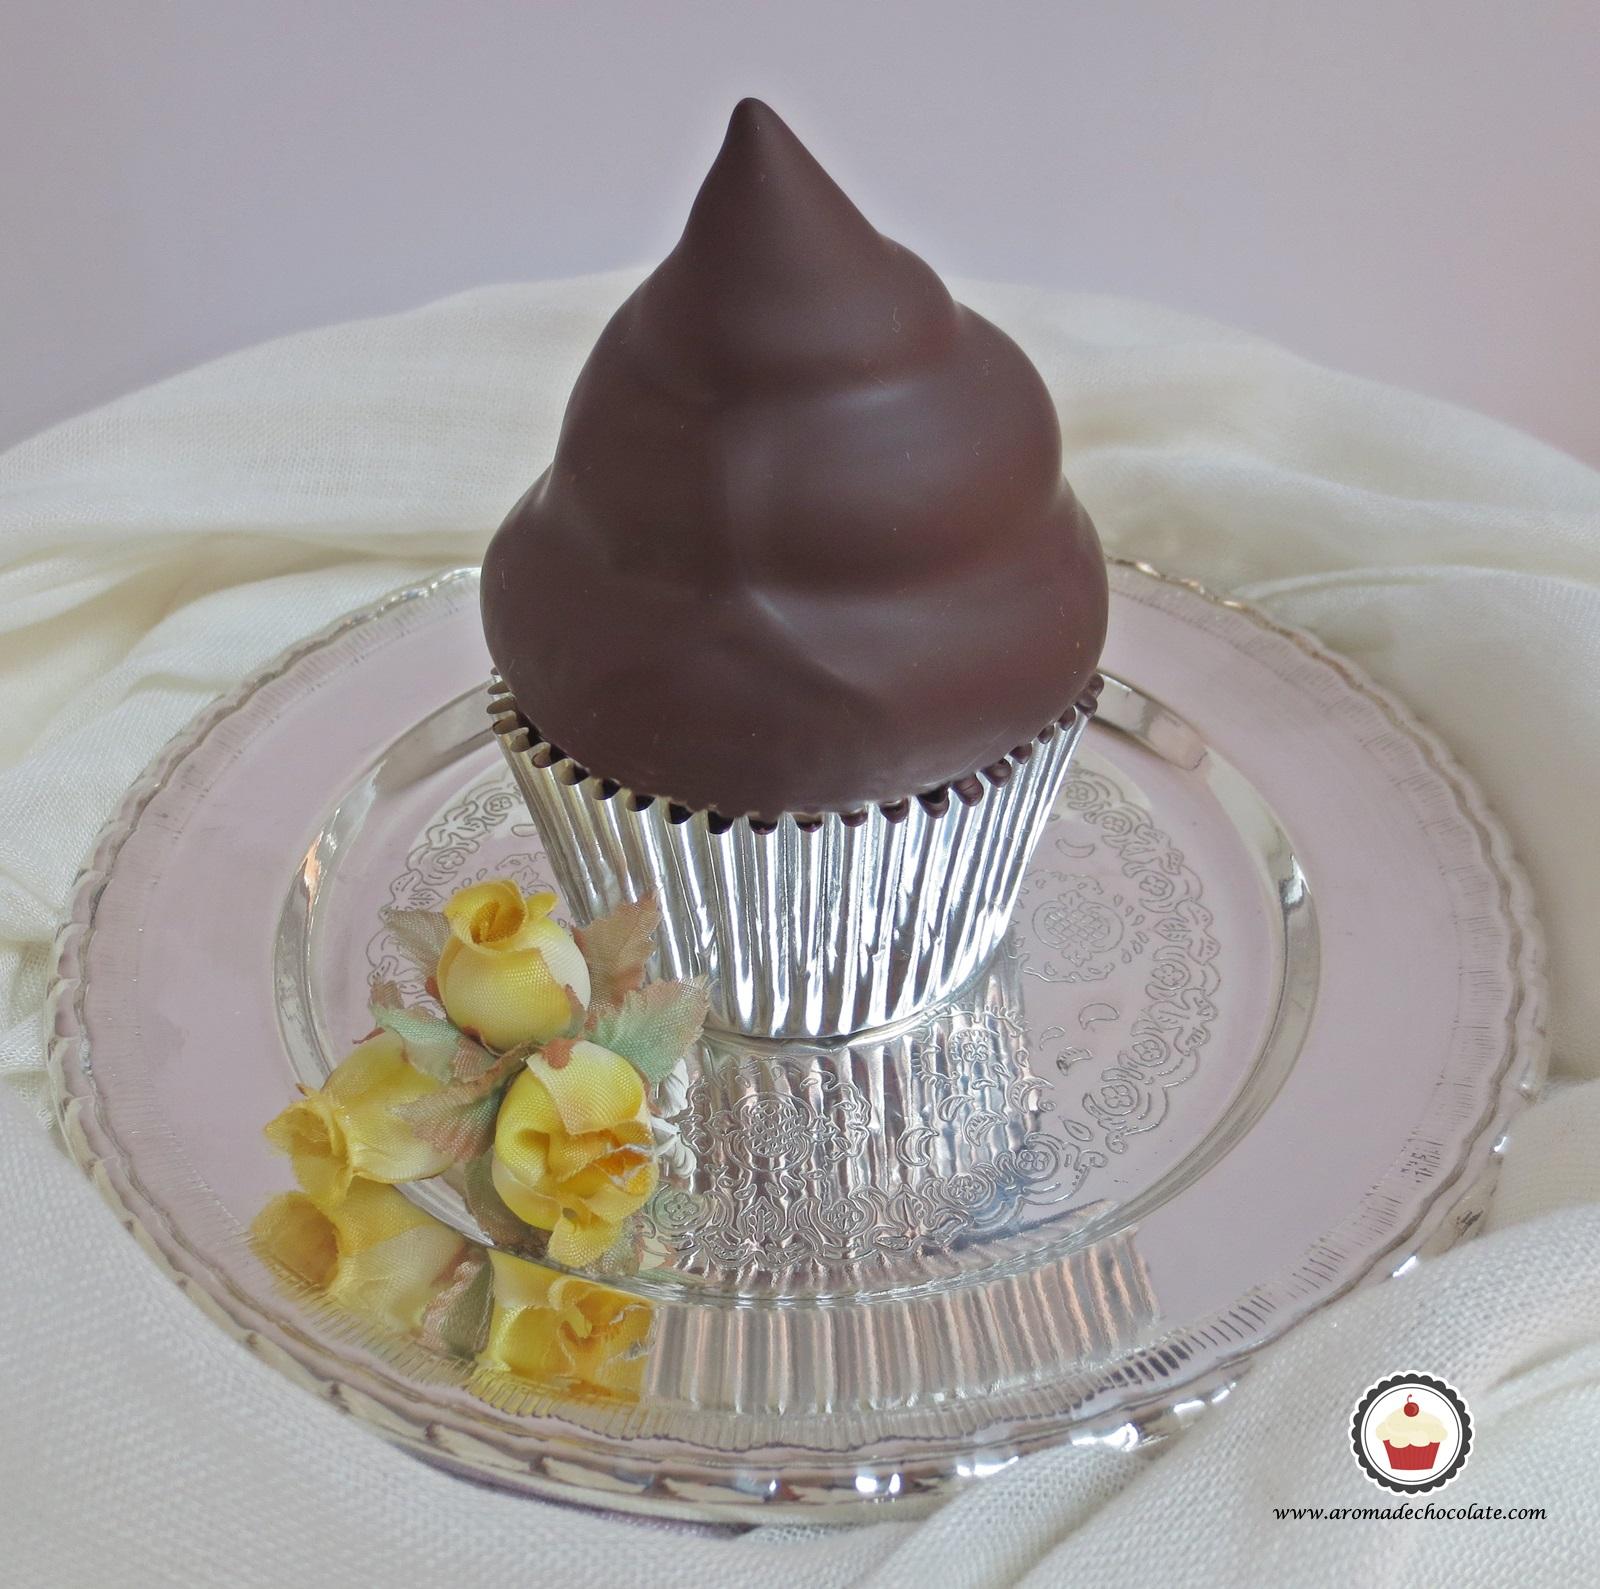 Hi Hat Cupcakes. Aroma de chocolate